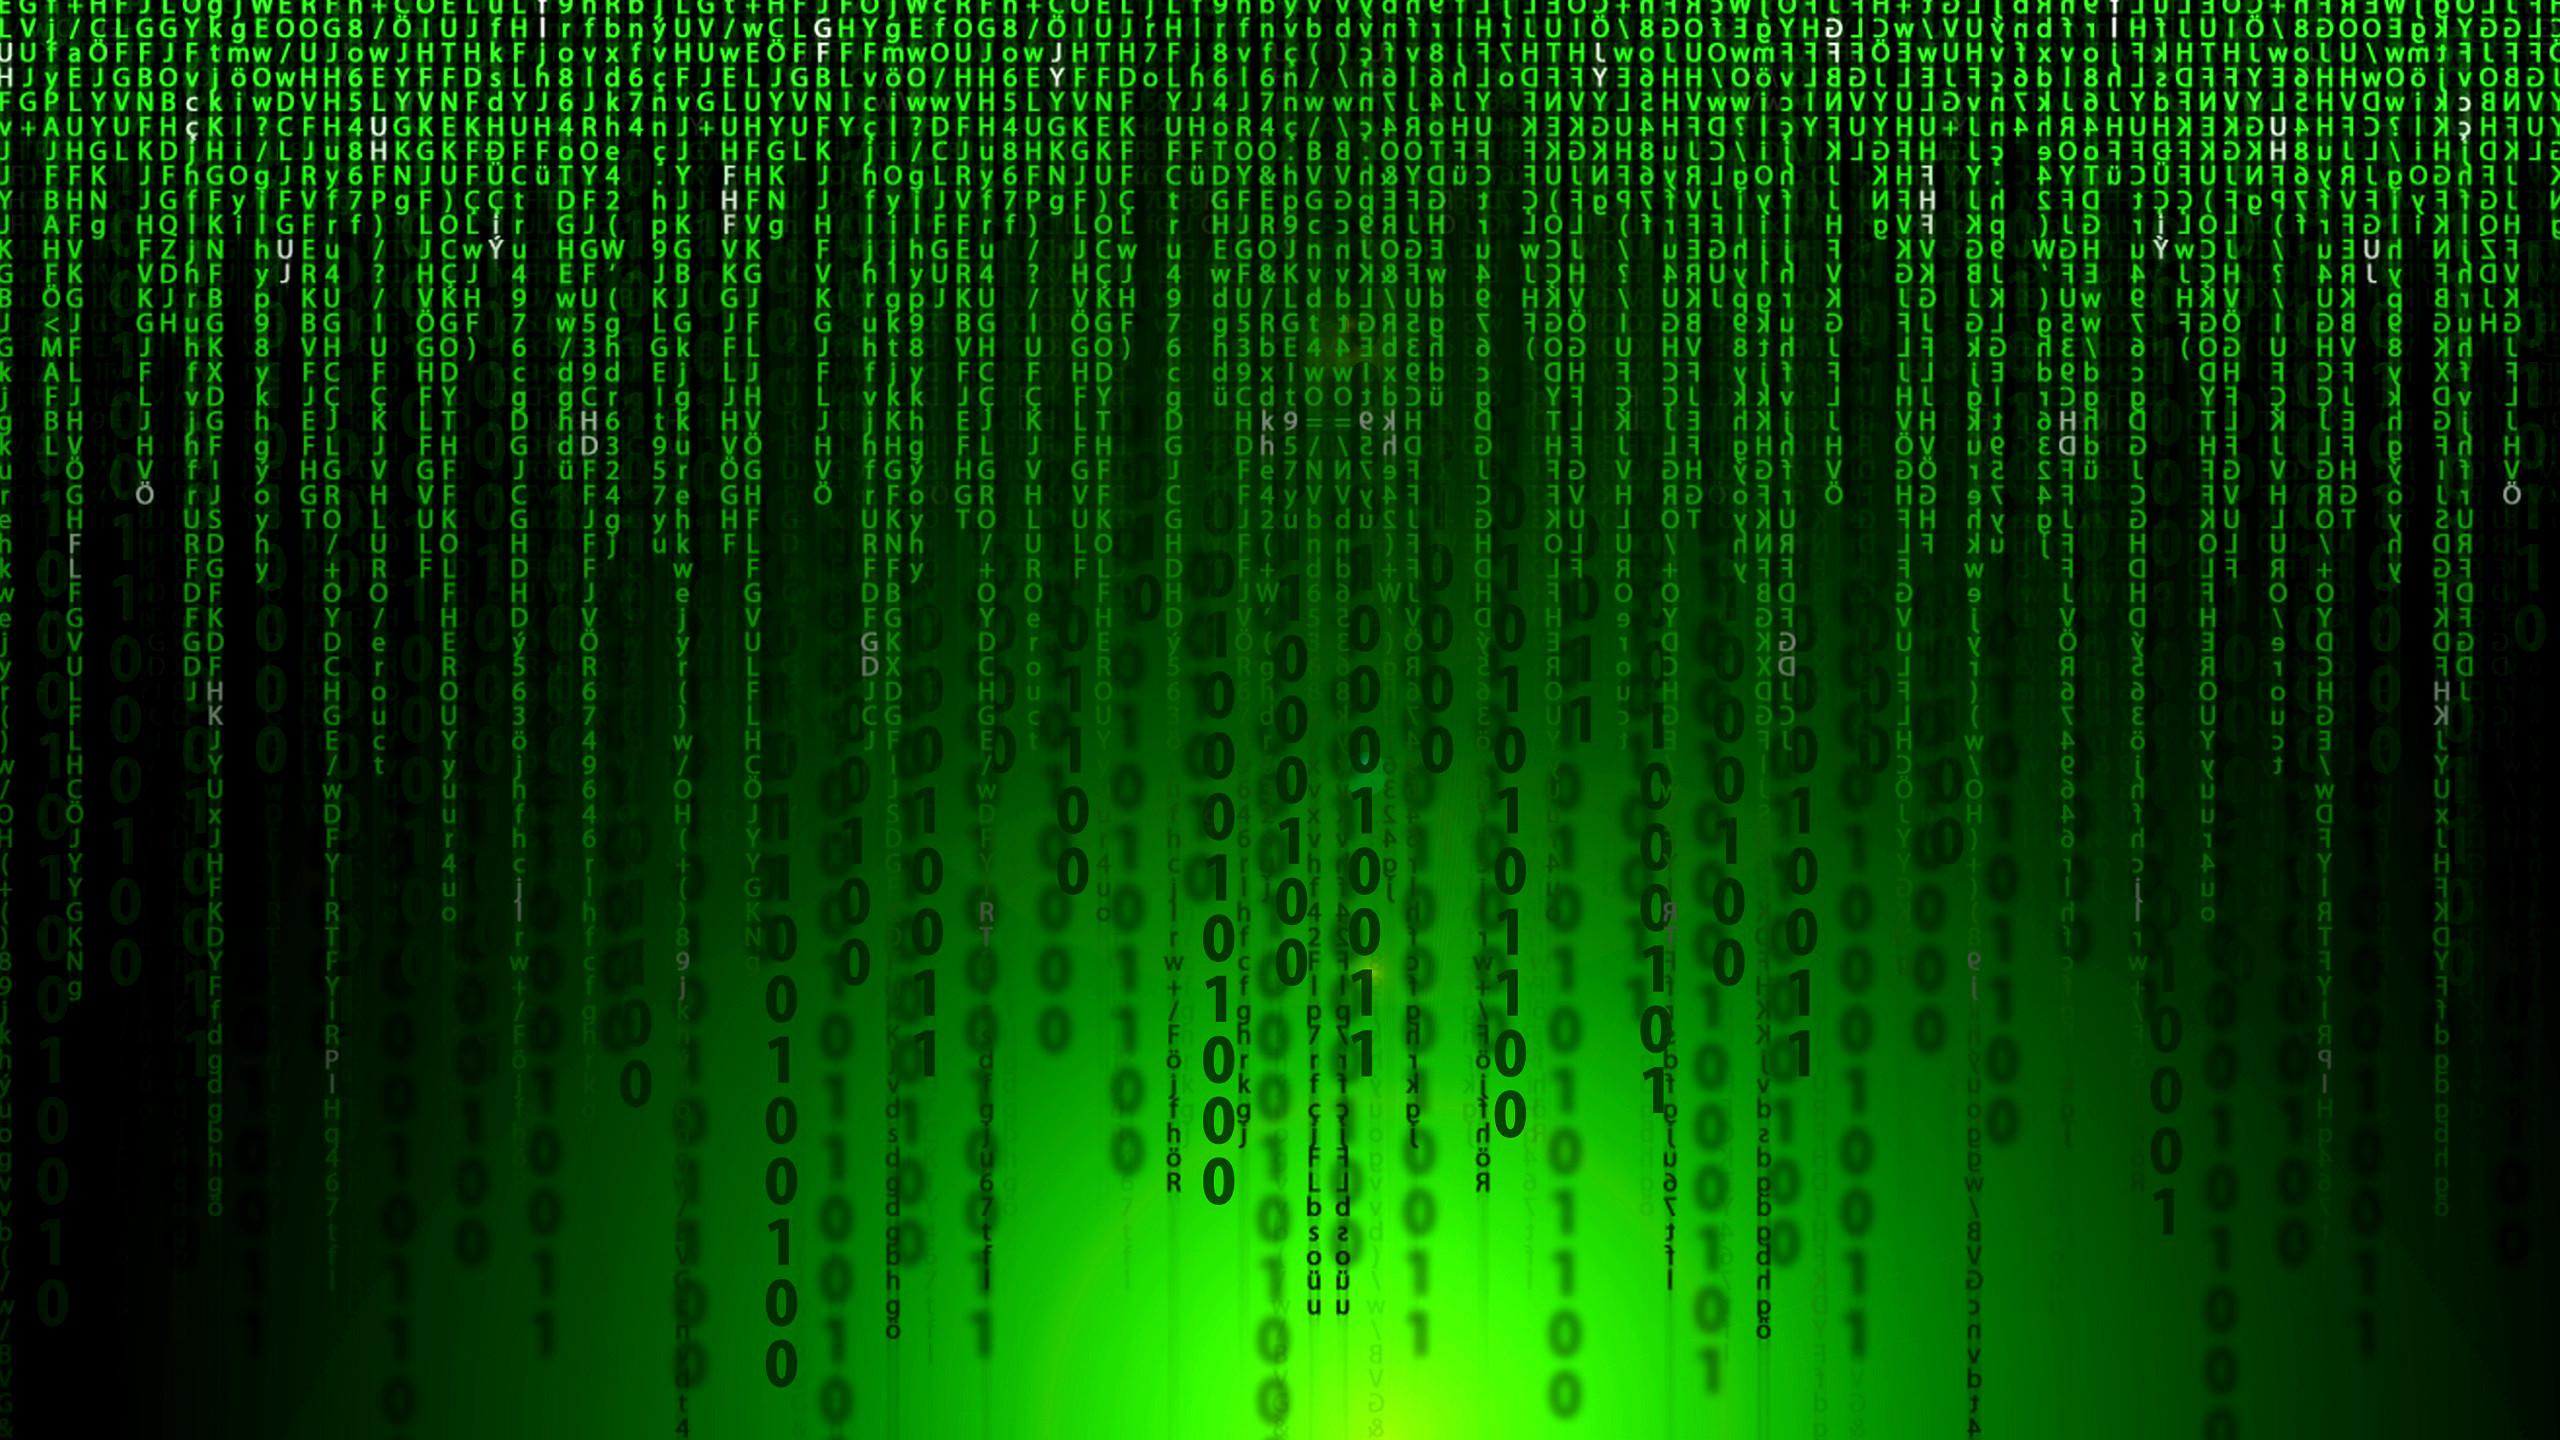 asian matrix type movie jpg 422x640